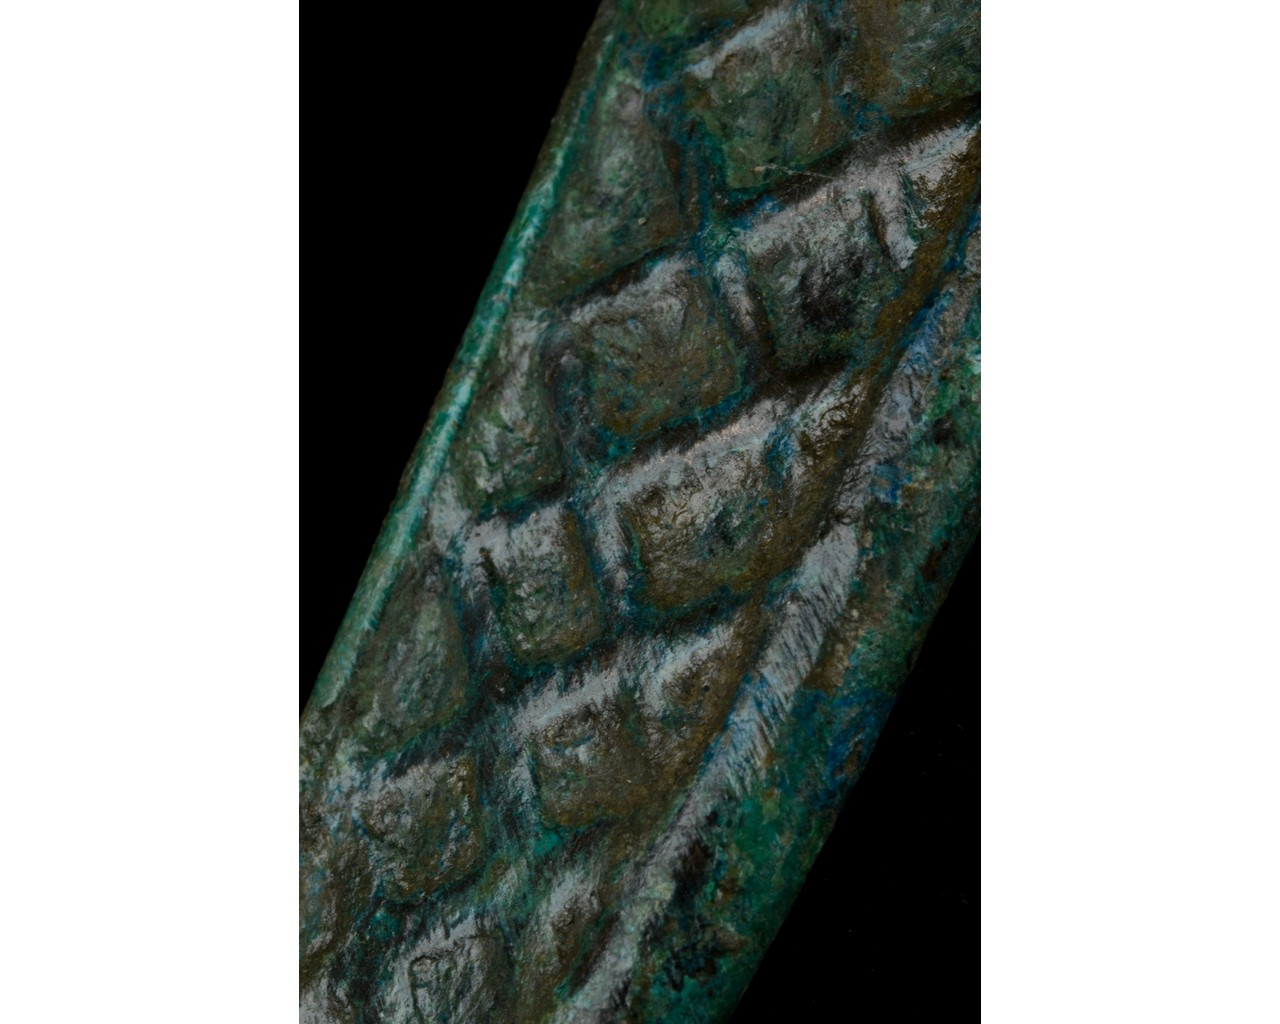 BRONZE AGE SWORD SHAPED PENDANT - Image 7 of 7